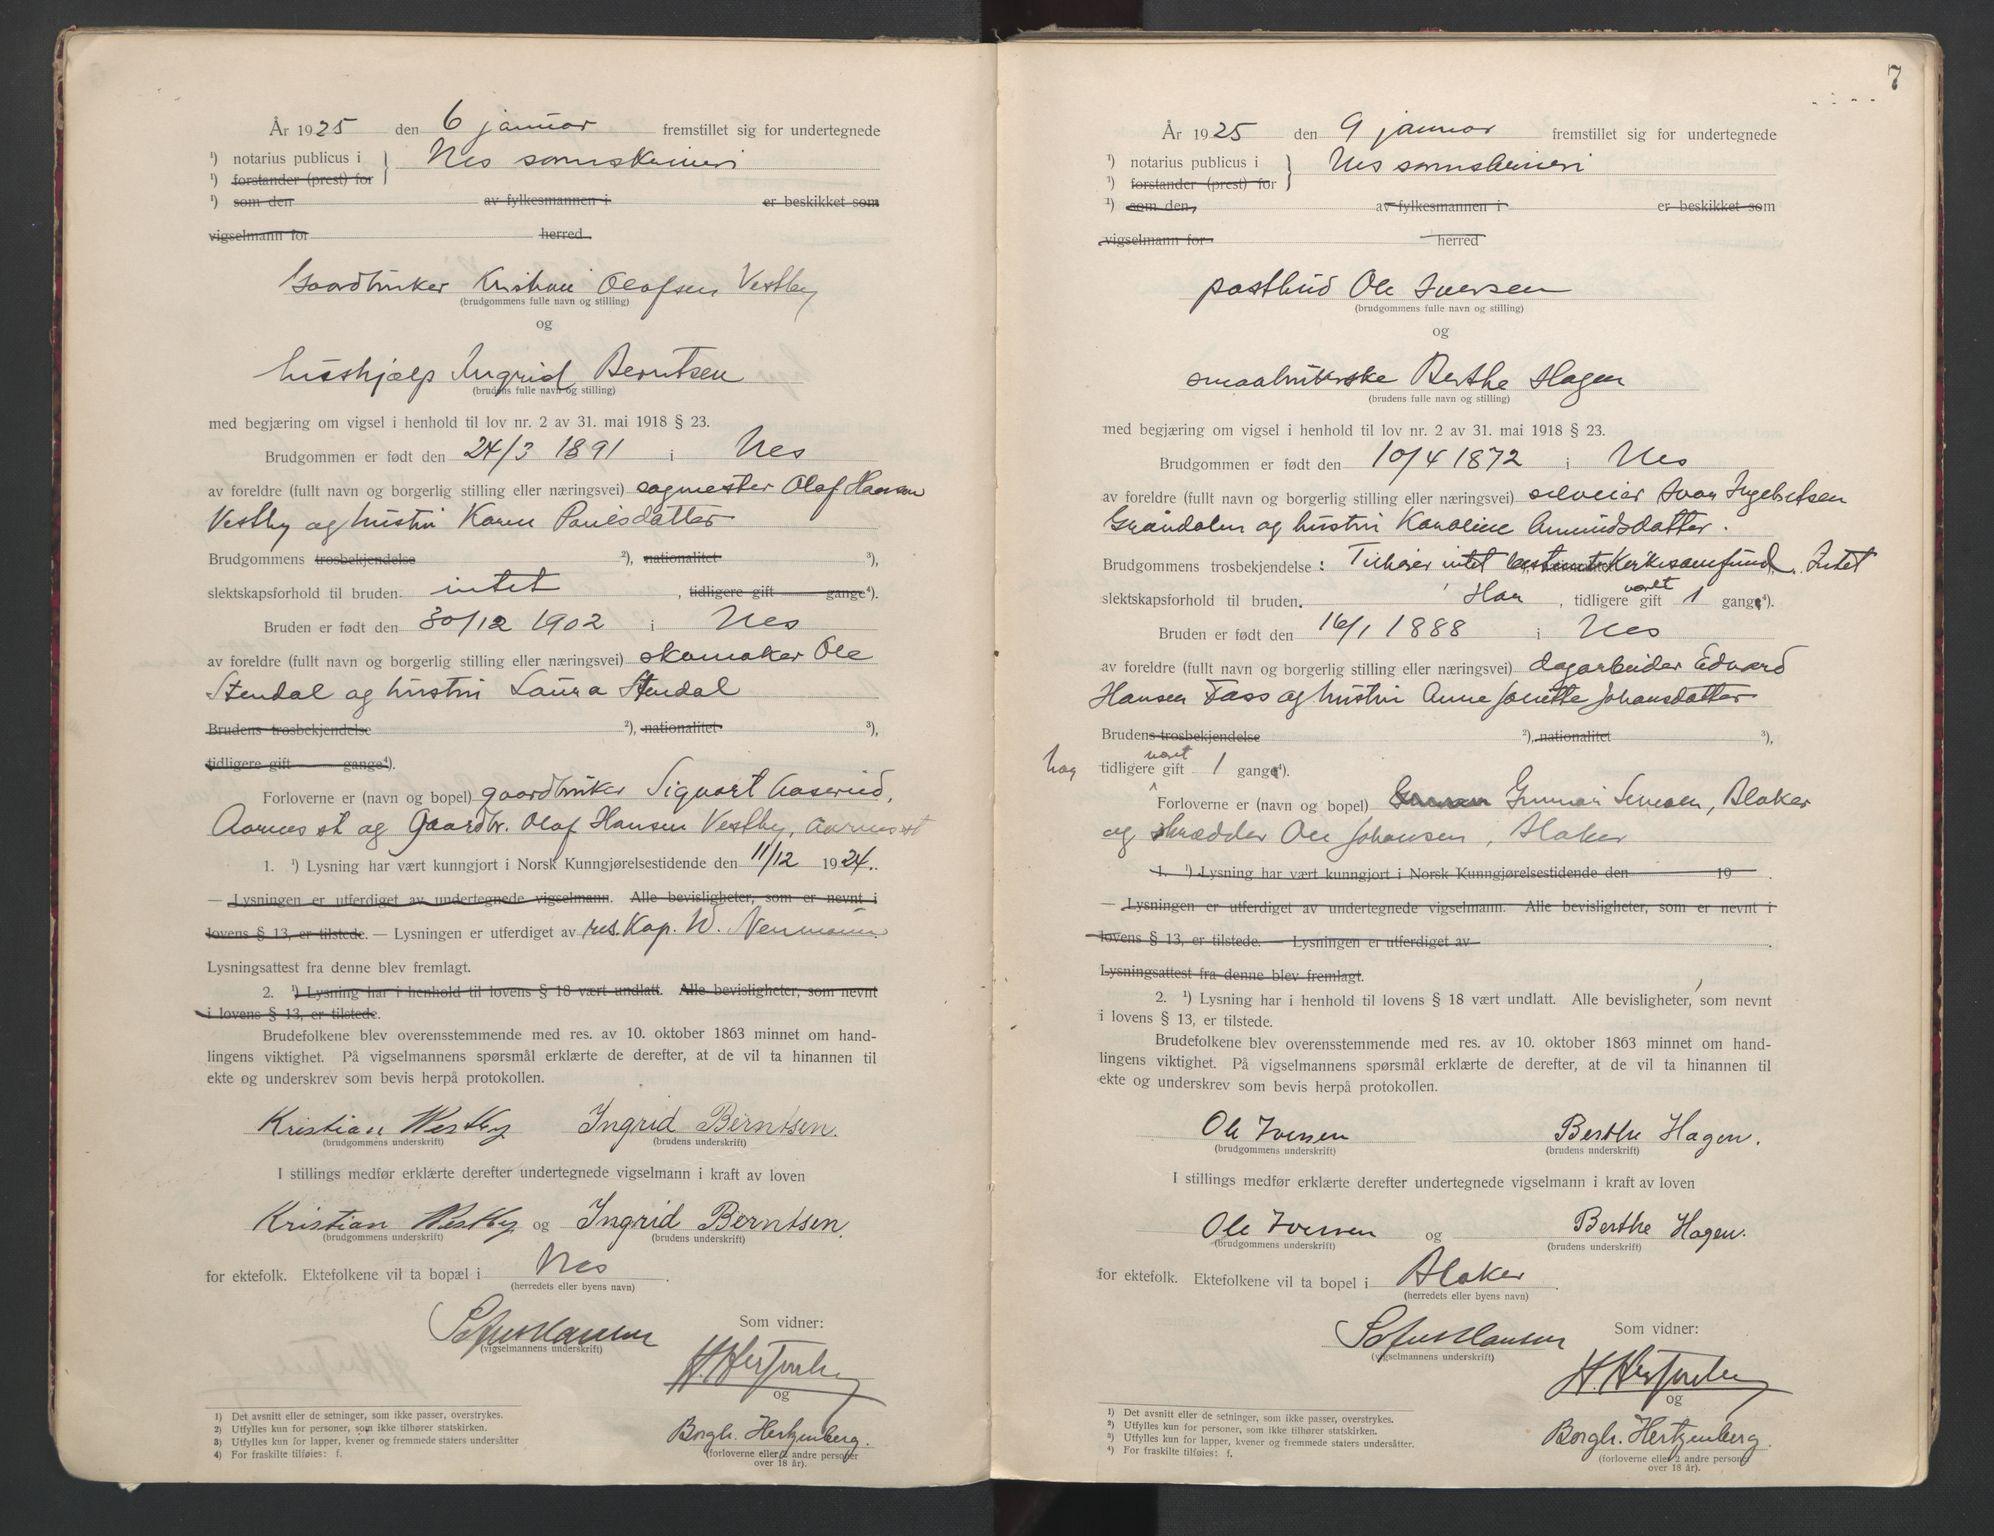 SAO, Nes tingrett, L/Lc/Lca/L0001: Vigselbok, 1920-1943, s. 7